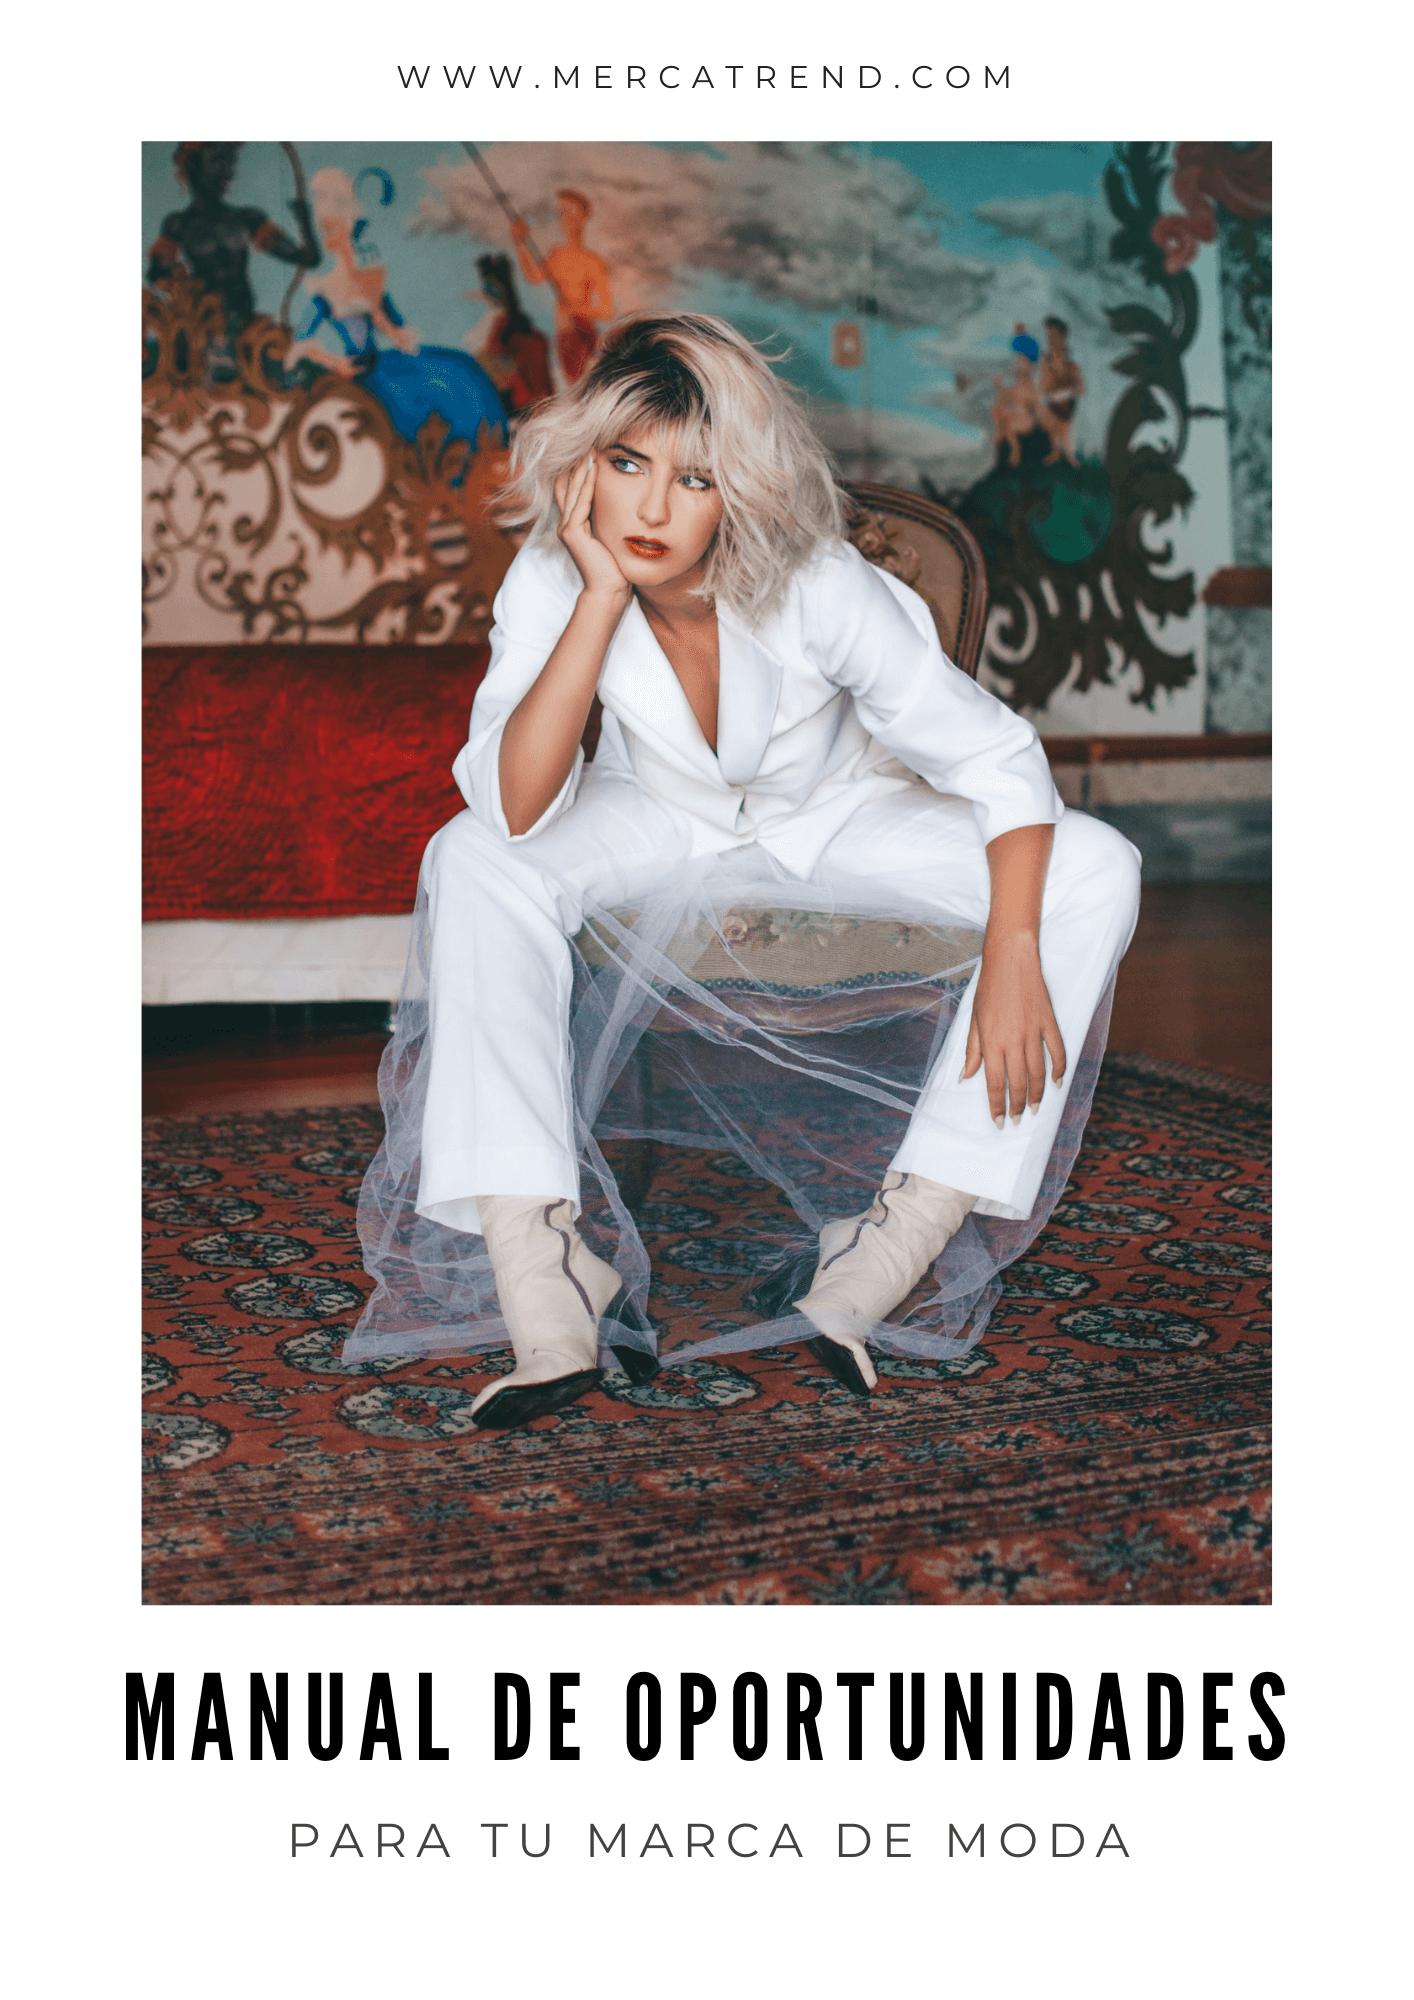 Manual oportunidades marcas de moda - Mercatrend Fashion School